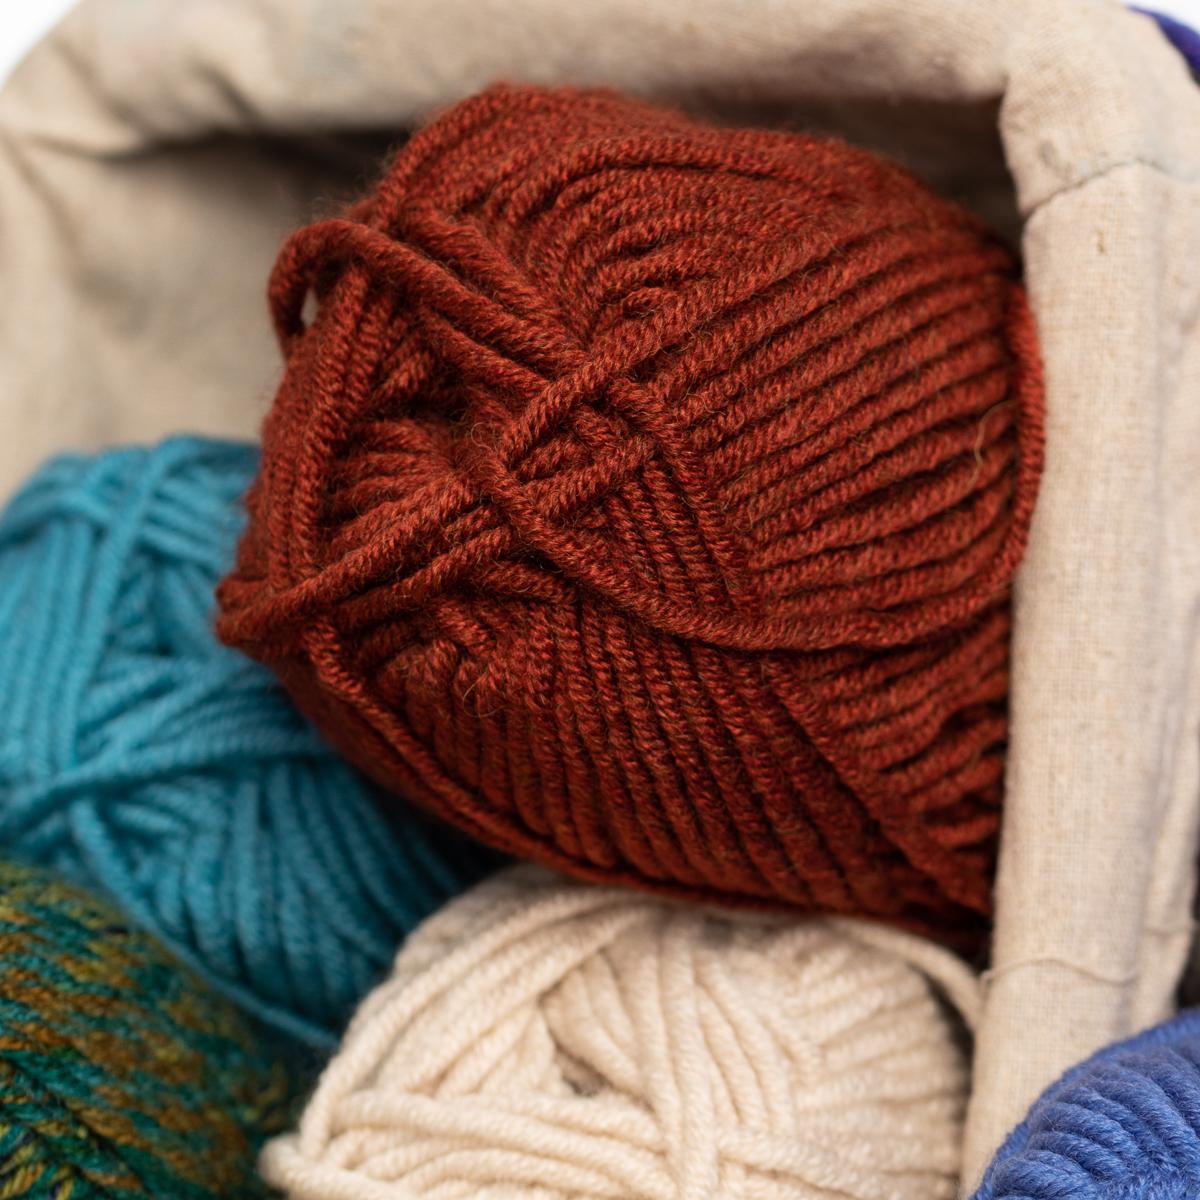 3pk-Lion-Brand-Woolspun-Acrylic-amp-Wool-Yarn-Bulky-5-Knit-Crocheting-Skeins-Soft thumbnail 62